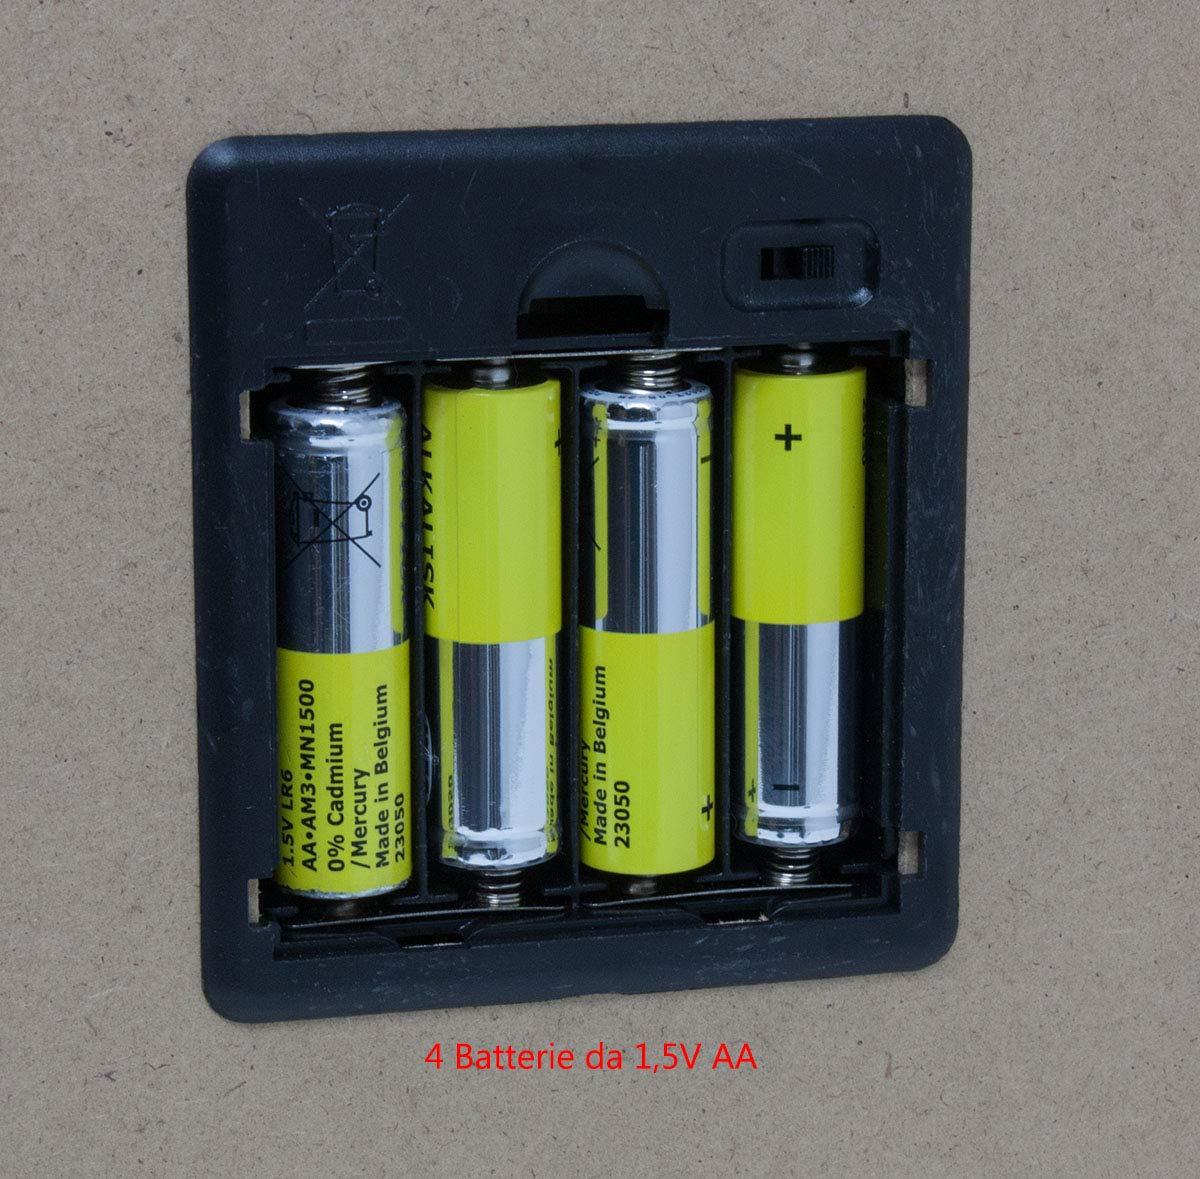 smartspec redondo biselado Auto Mini aire fr/ío ingesta 25/mm coche filtros de aire